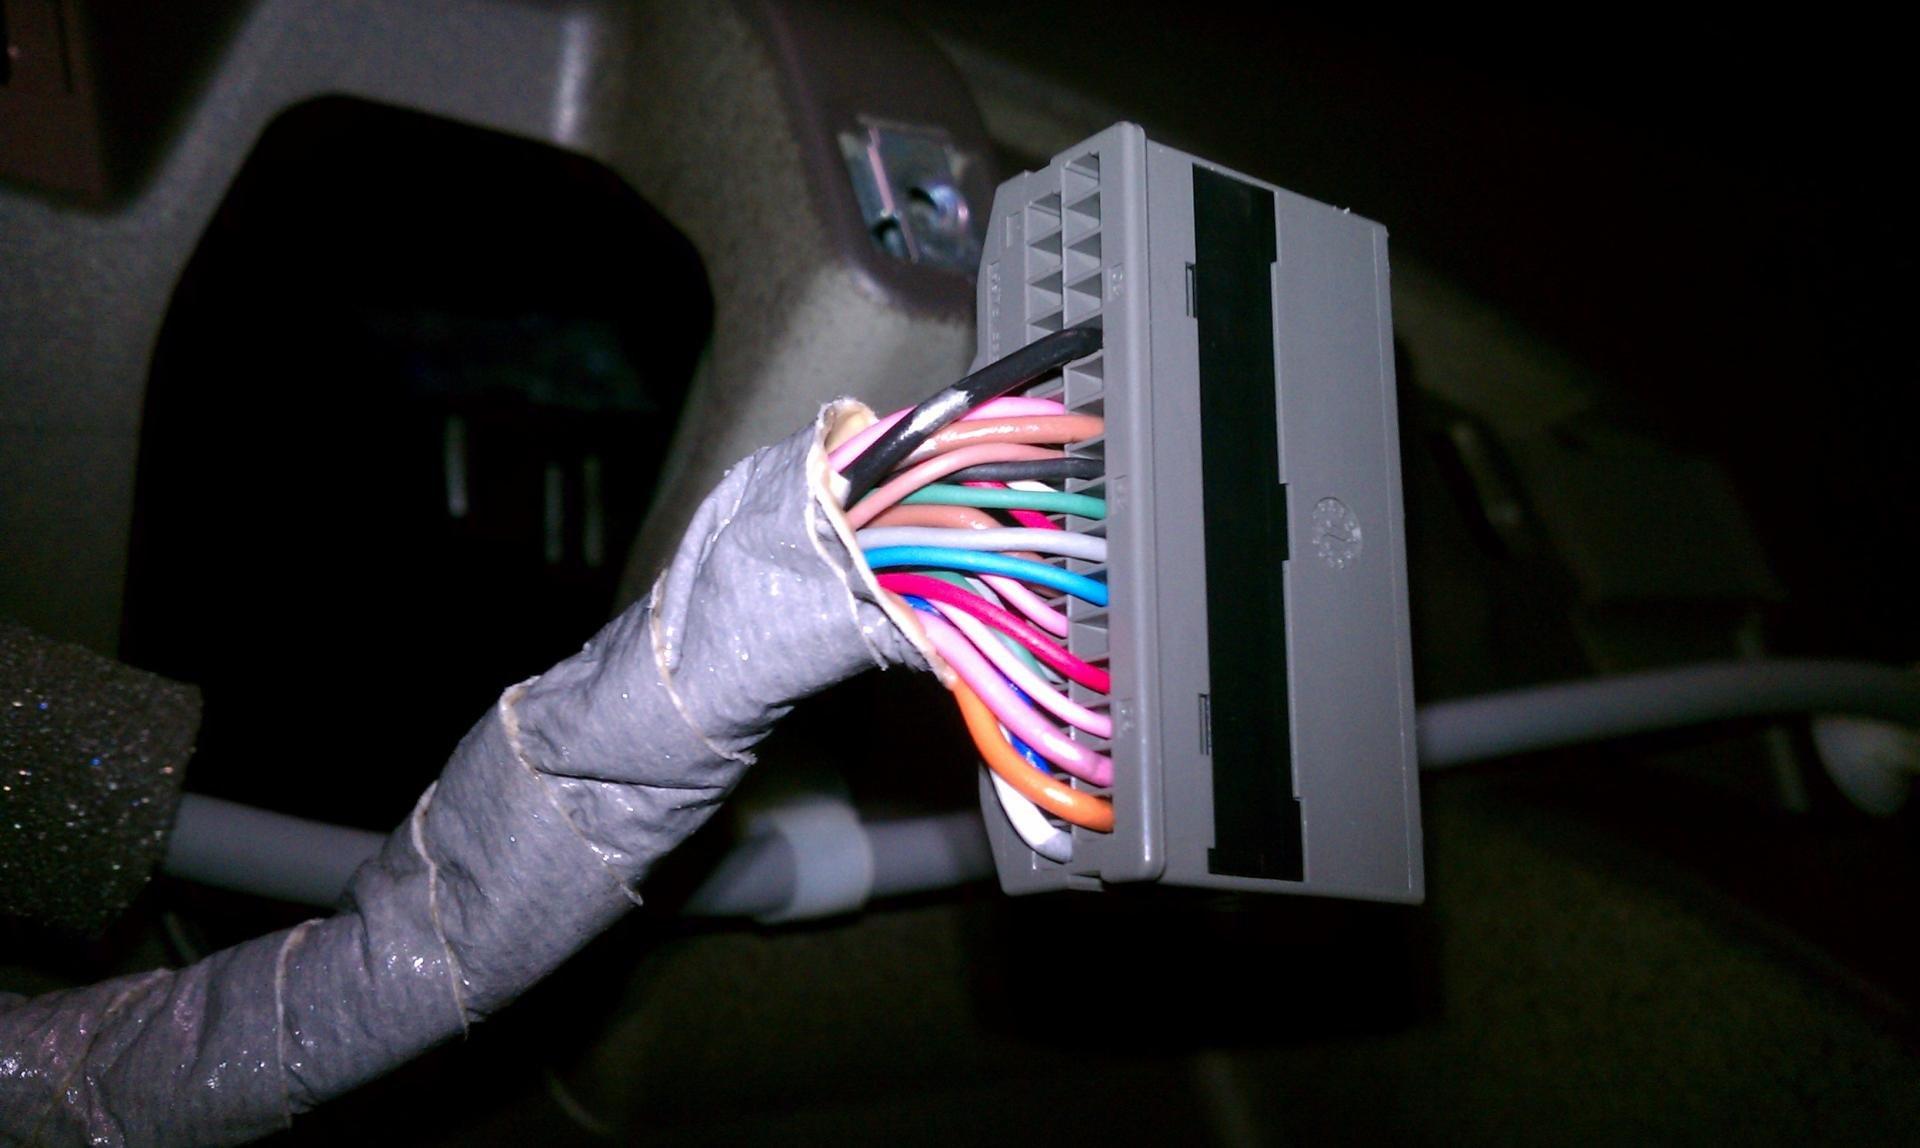 Honda Backup Camera Wiring Harness Diagram Civic 2012 Navigation Reverse Page 27 Fuel Filter